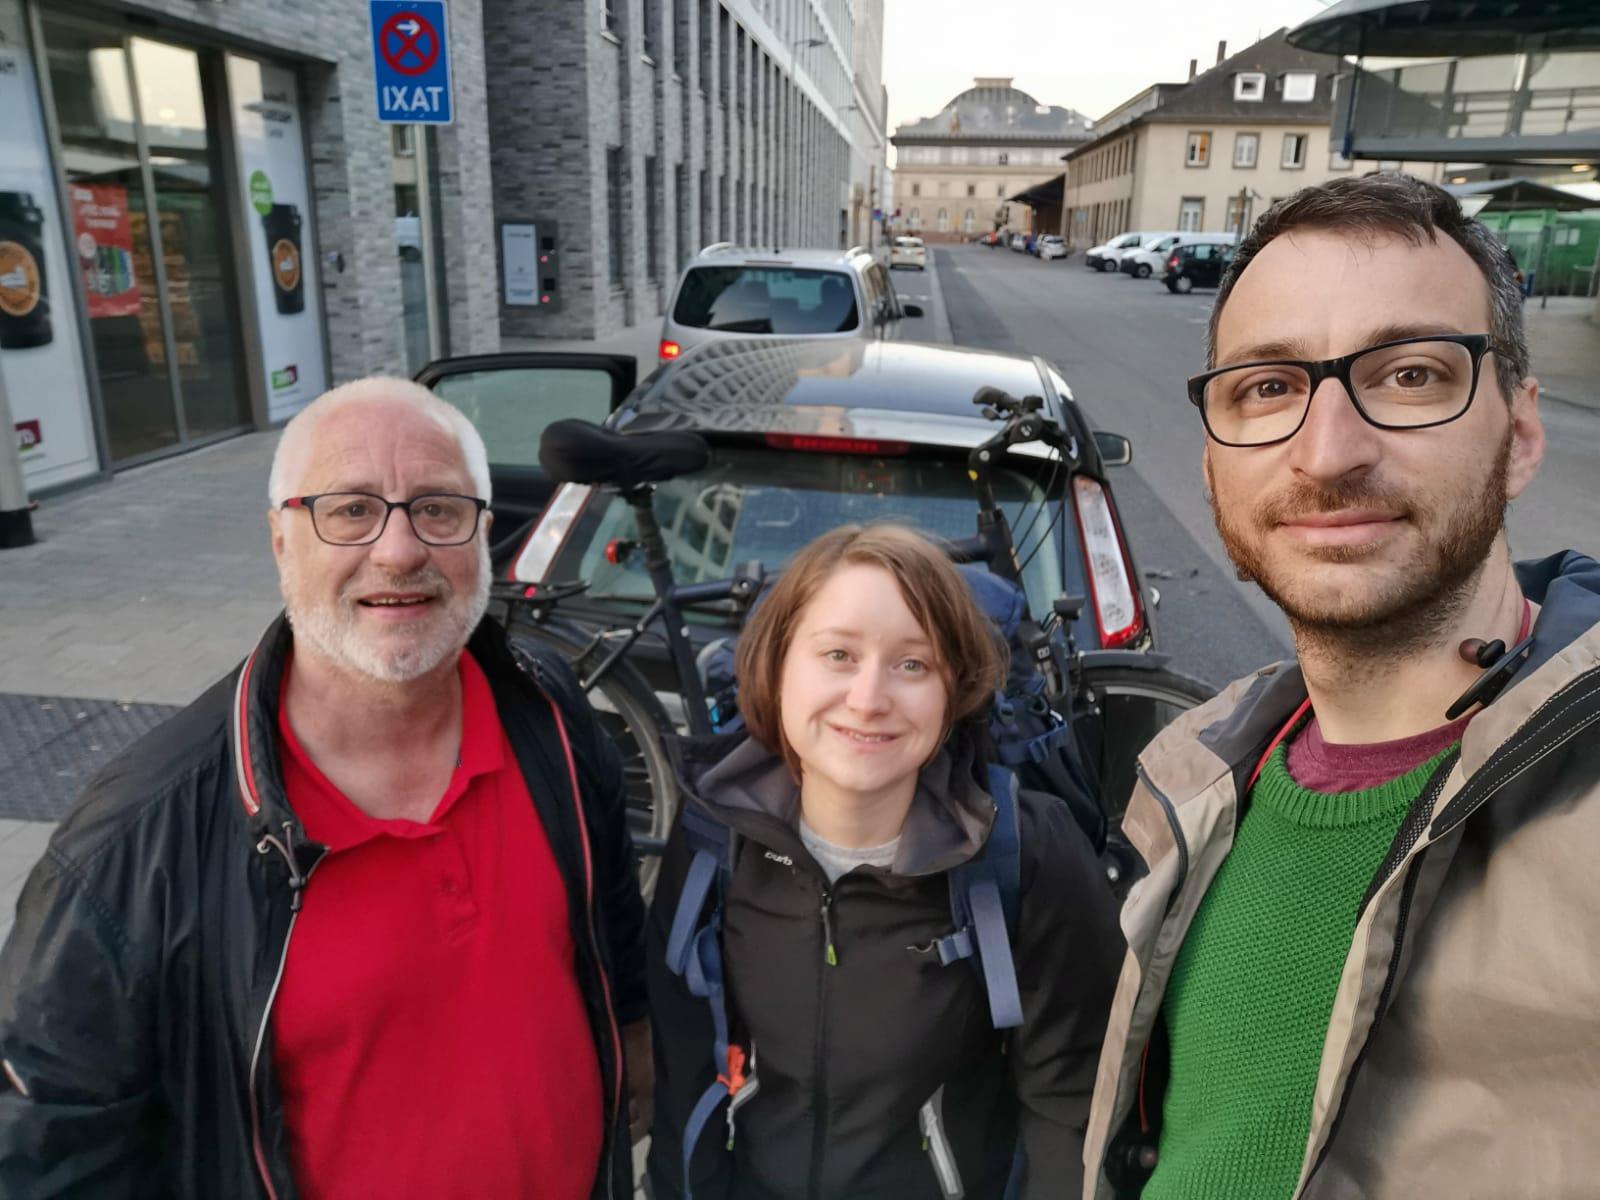 VIP Abholservice um 5:45 Uhr in Mannheim